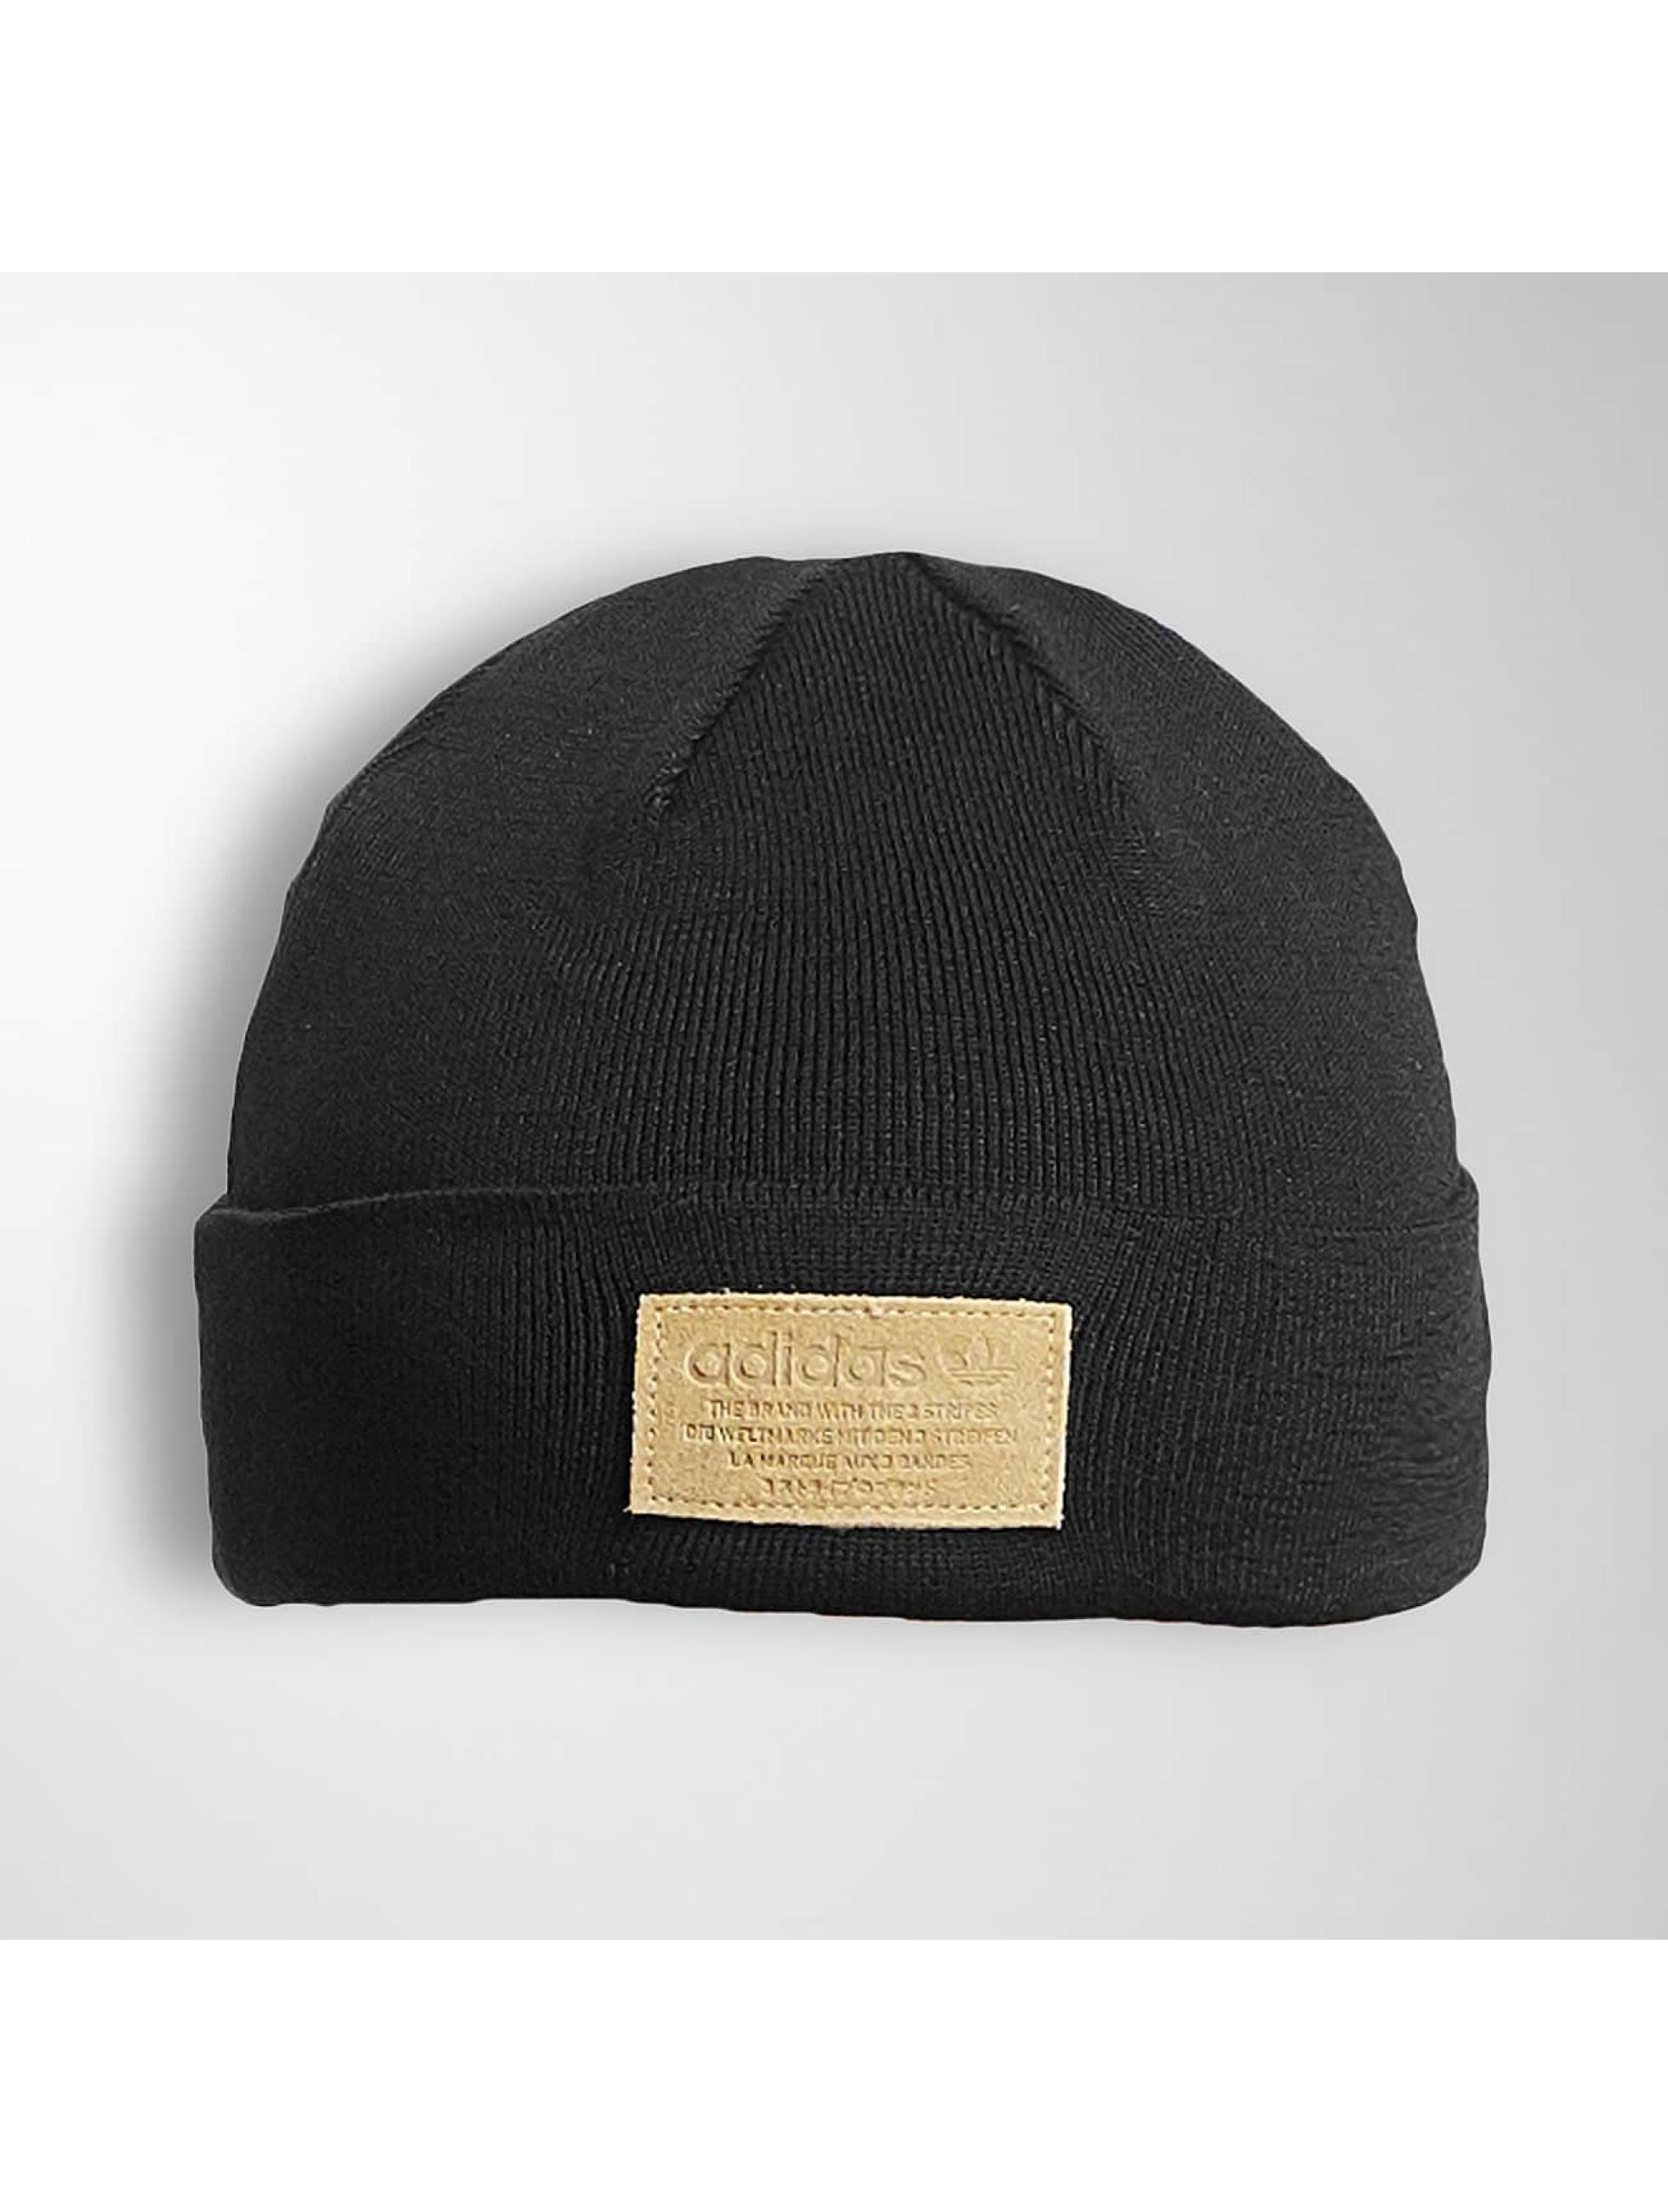 adidas Hat-1 NMD black